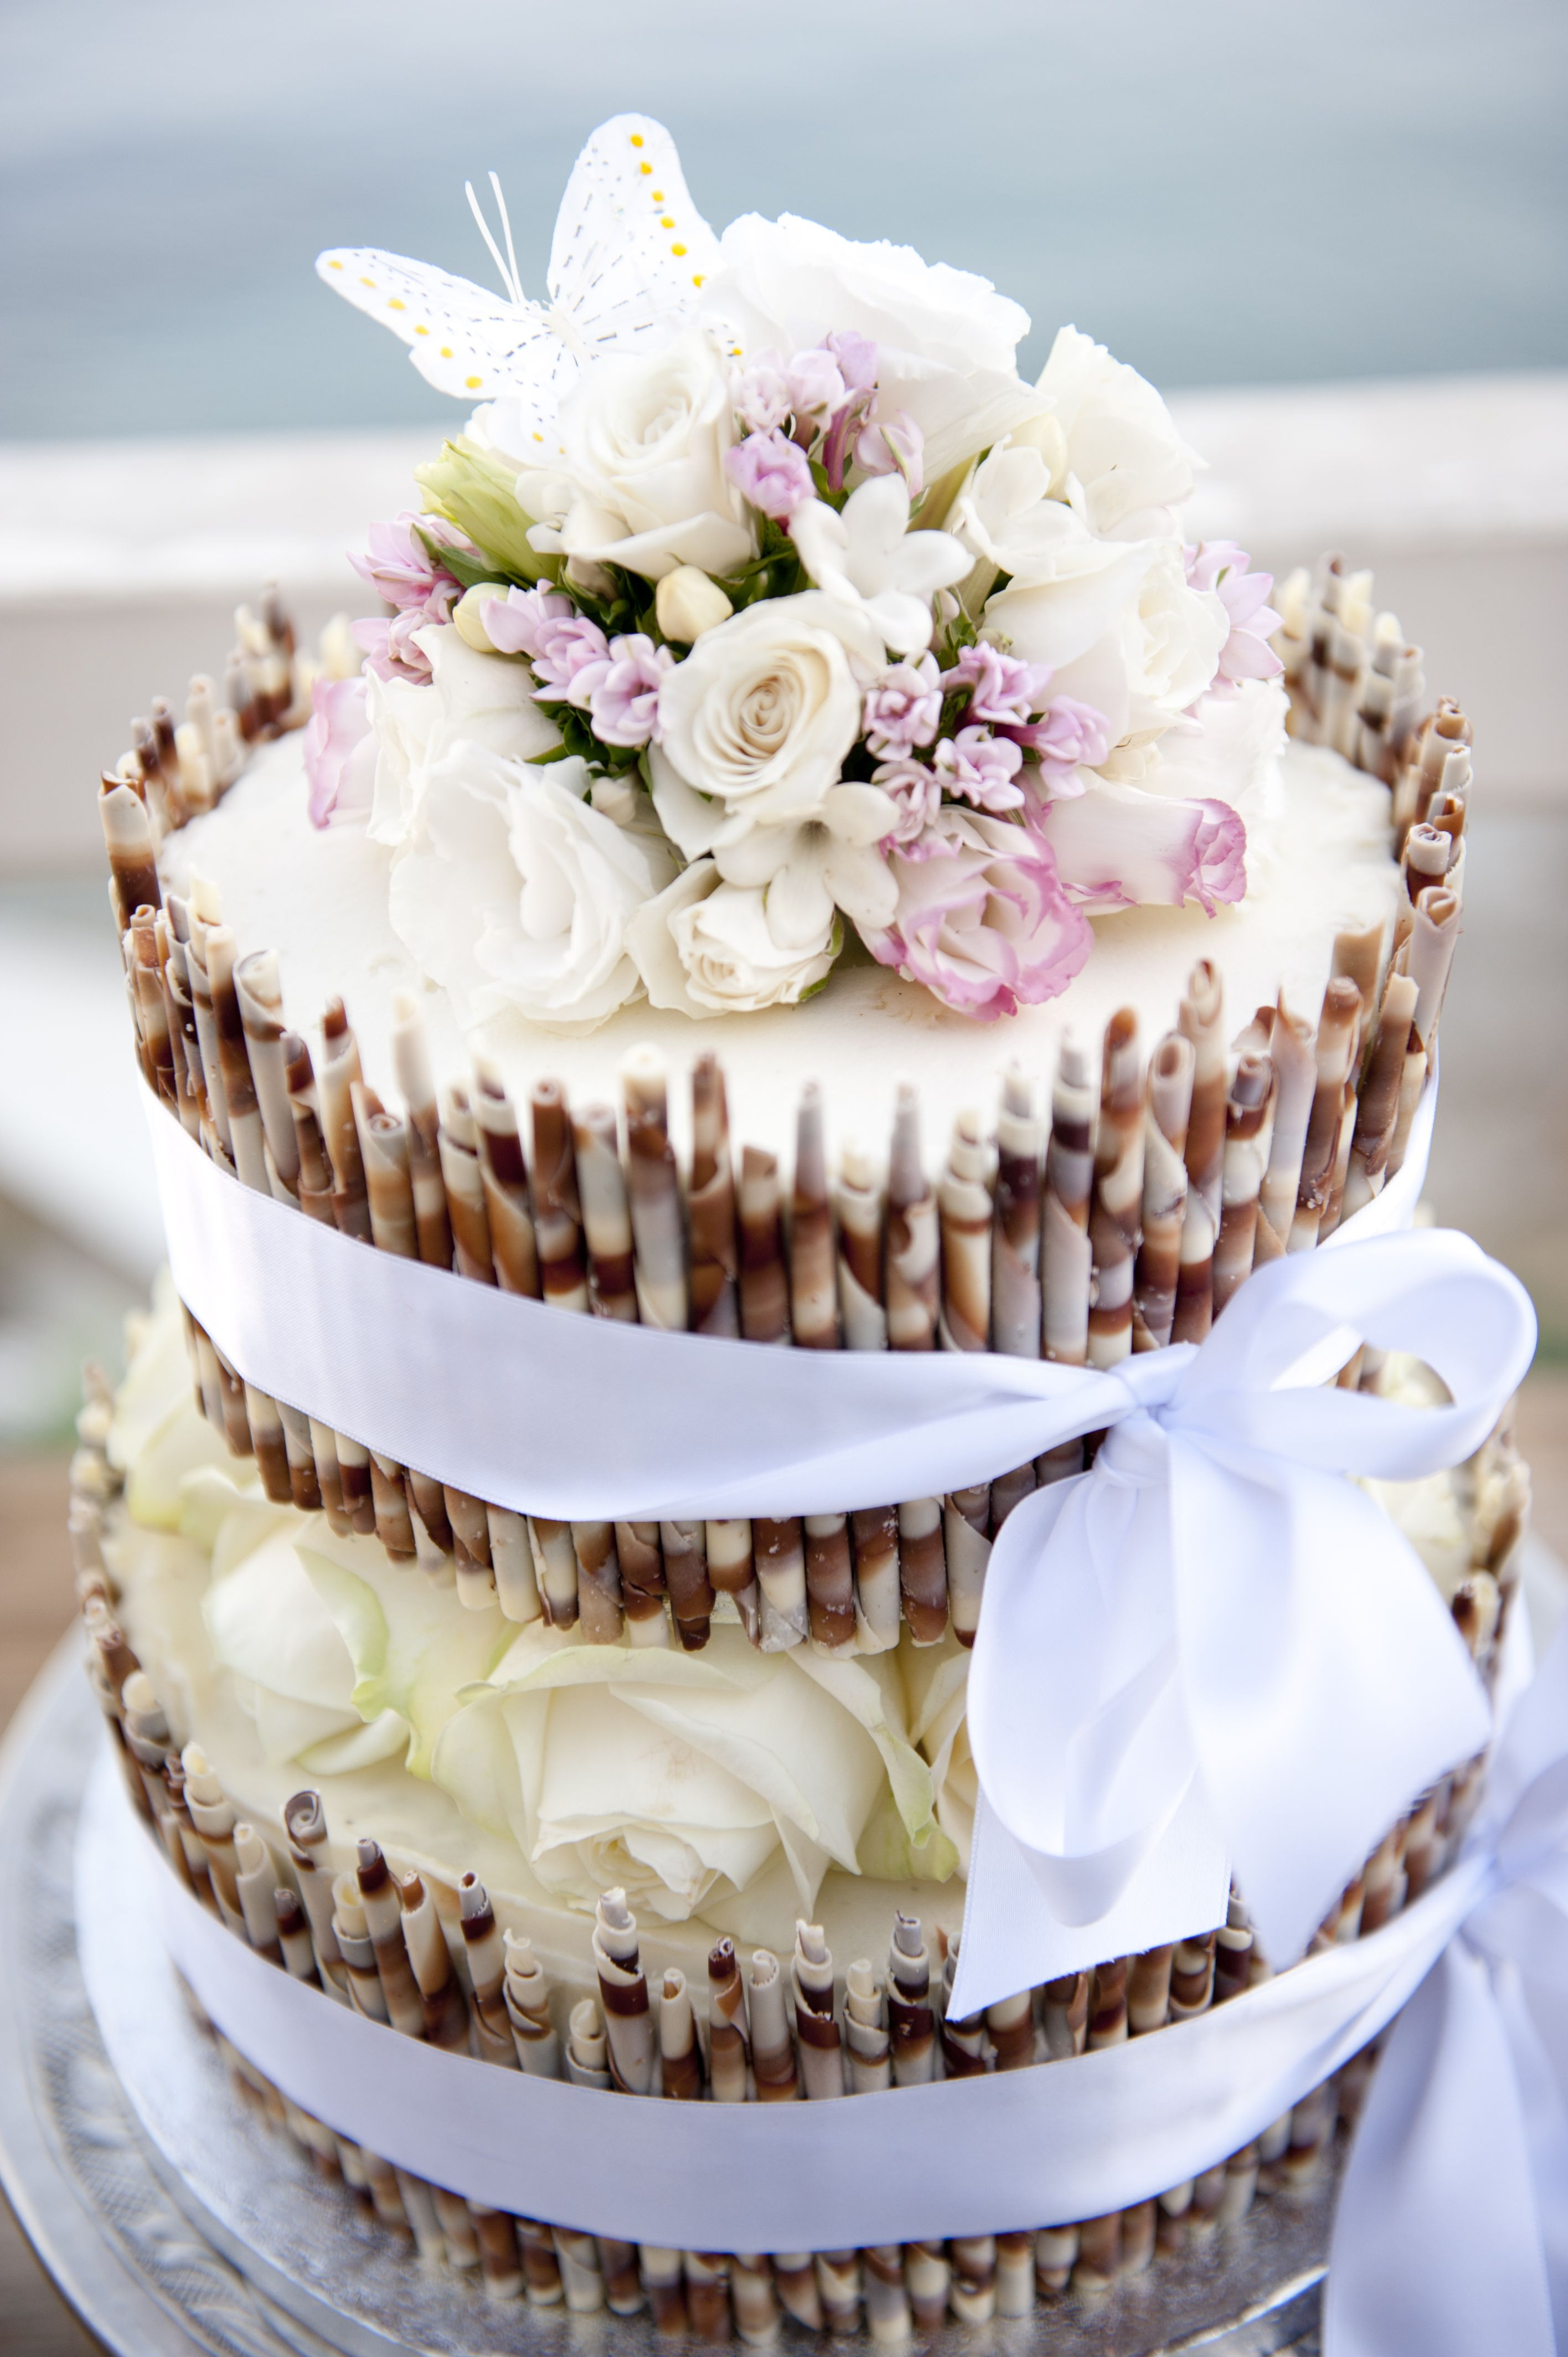 White Chocolate Cheesecake Wedding Cake For A Spring Wedding